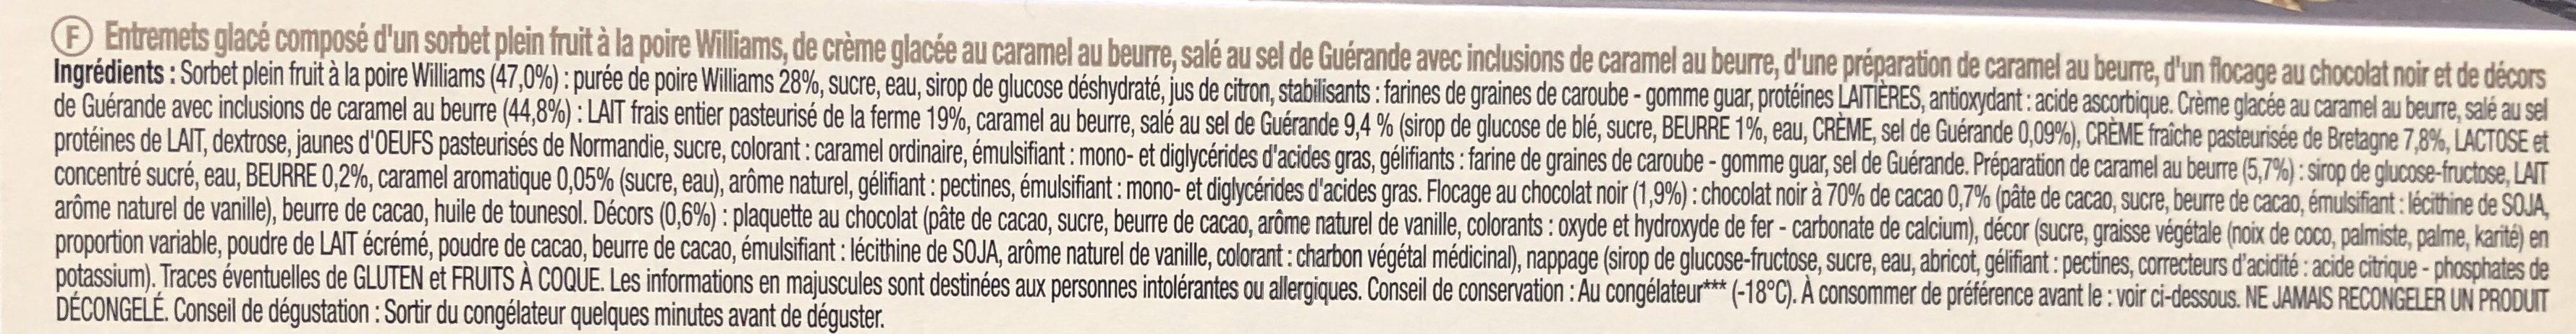 Bûche Glacée Artisanale Poire, Caramel au Beurre Salé - Ingrediënten - fr